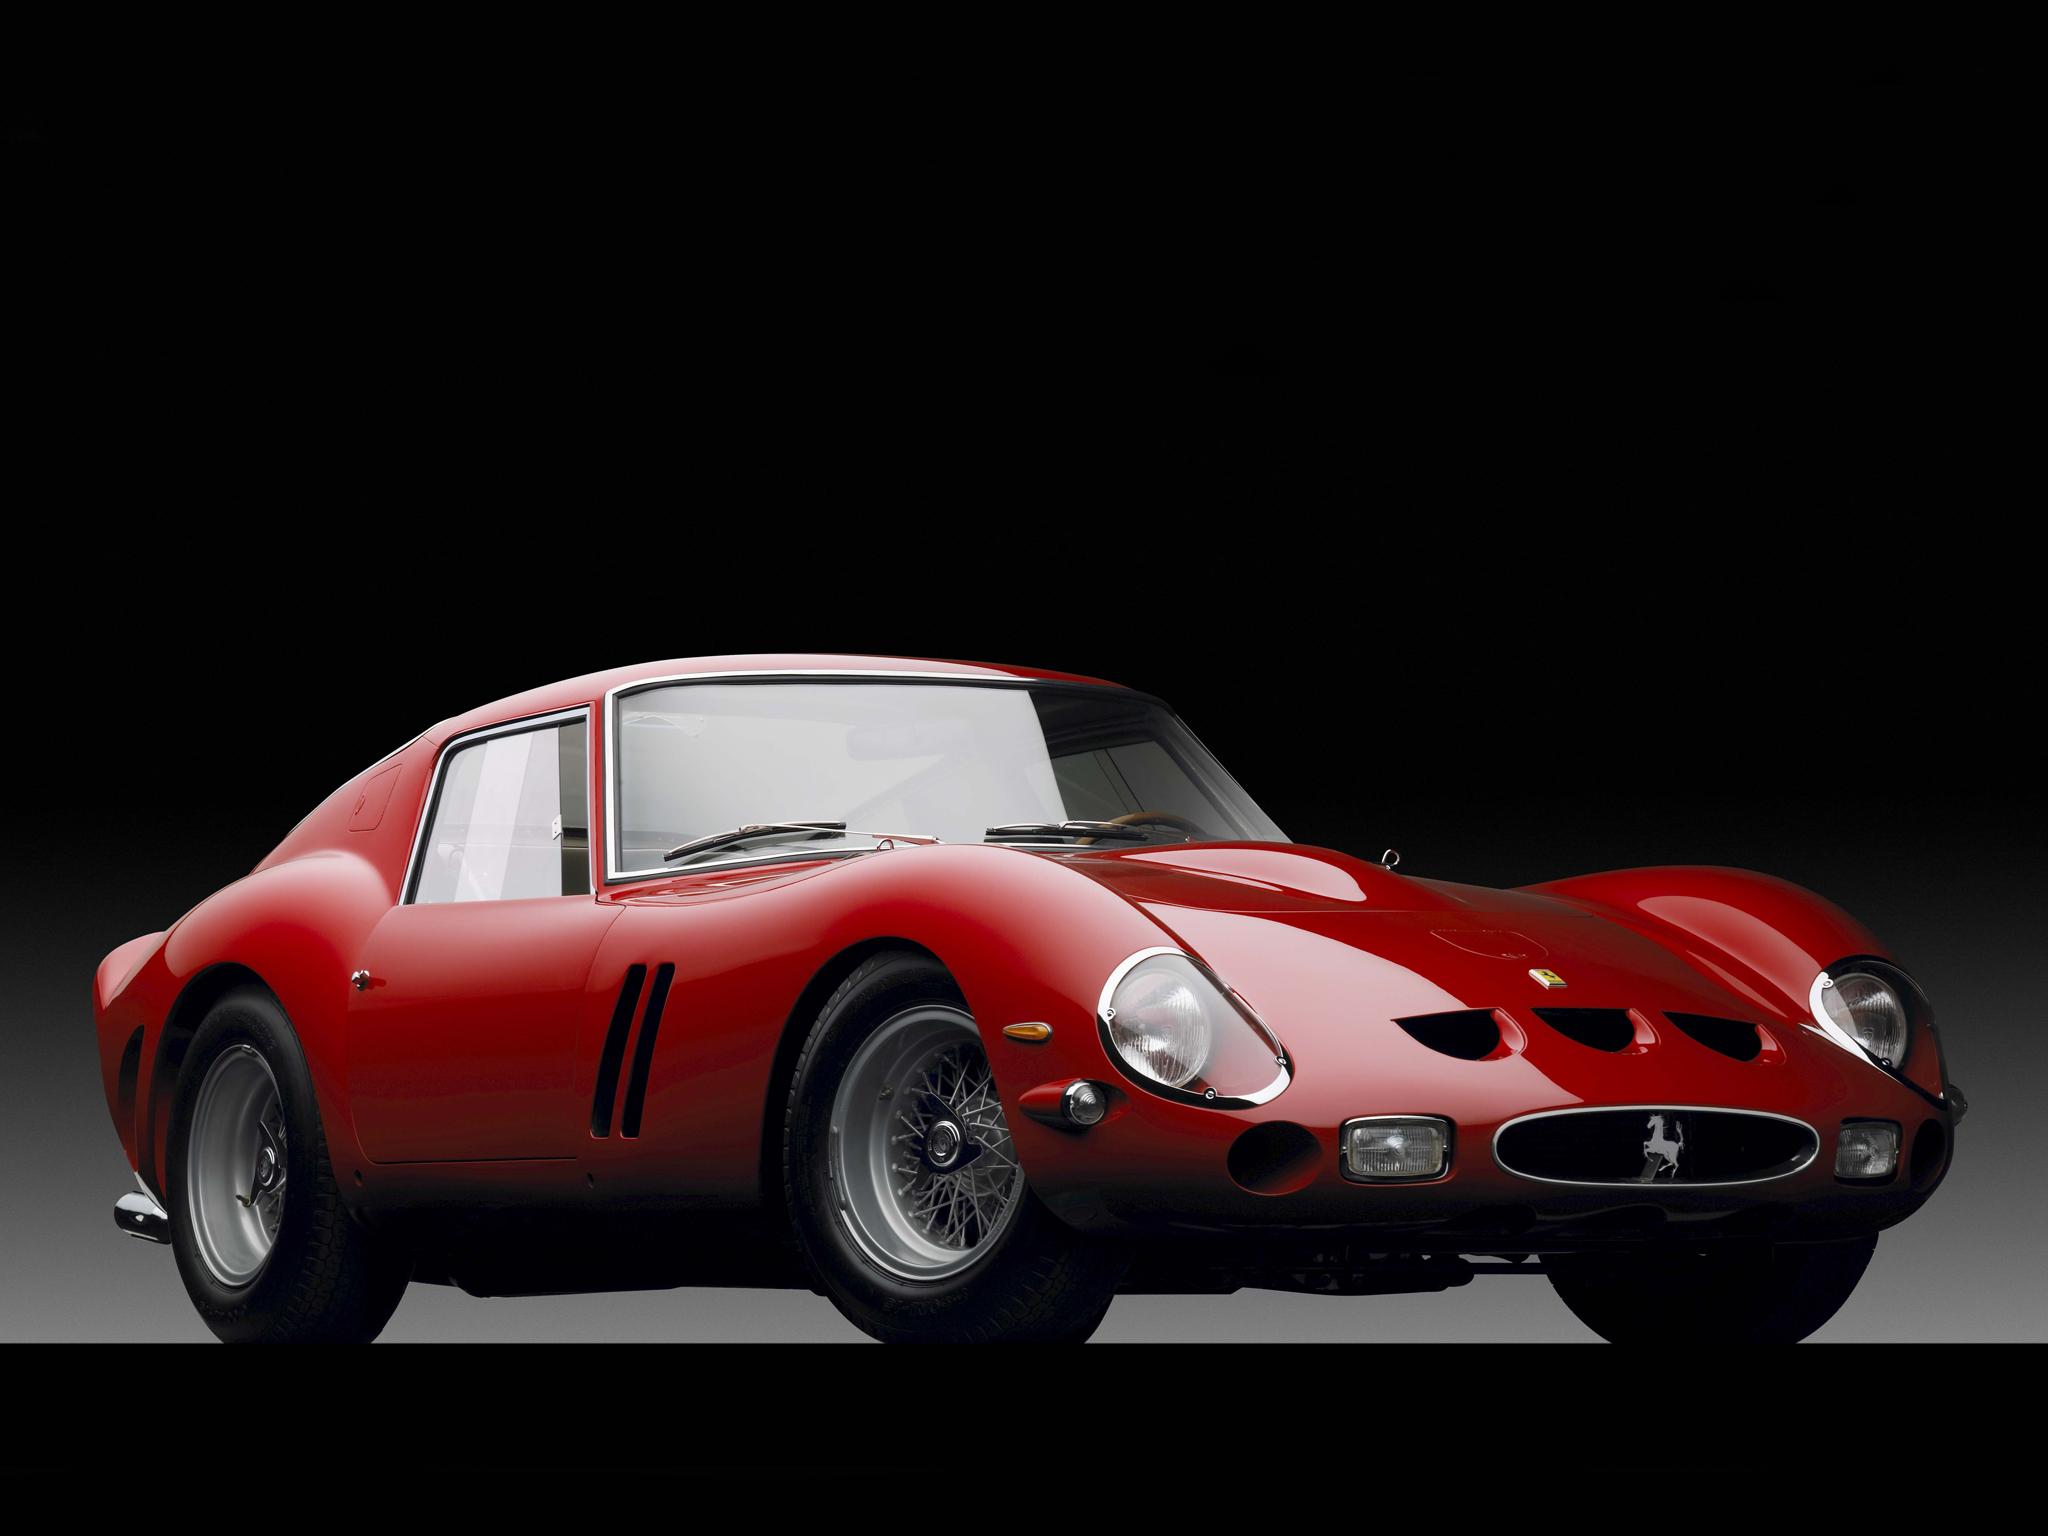 QUE COCHE - Página 2 1962_Ferrari_250_GTO_Michael_Furman_01